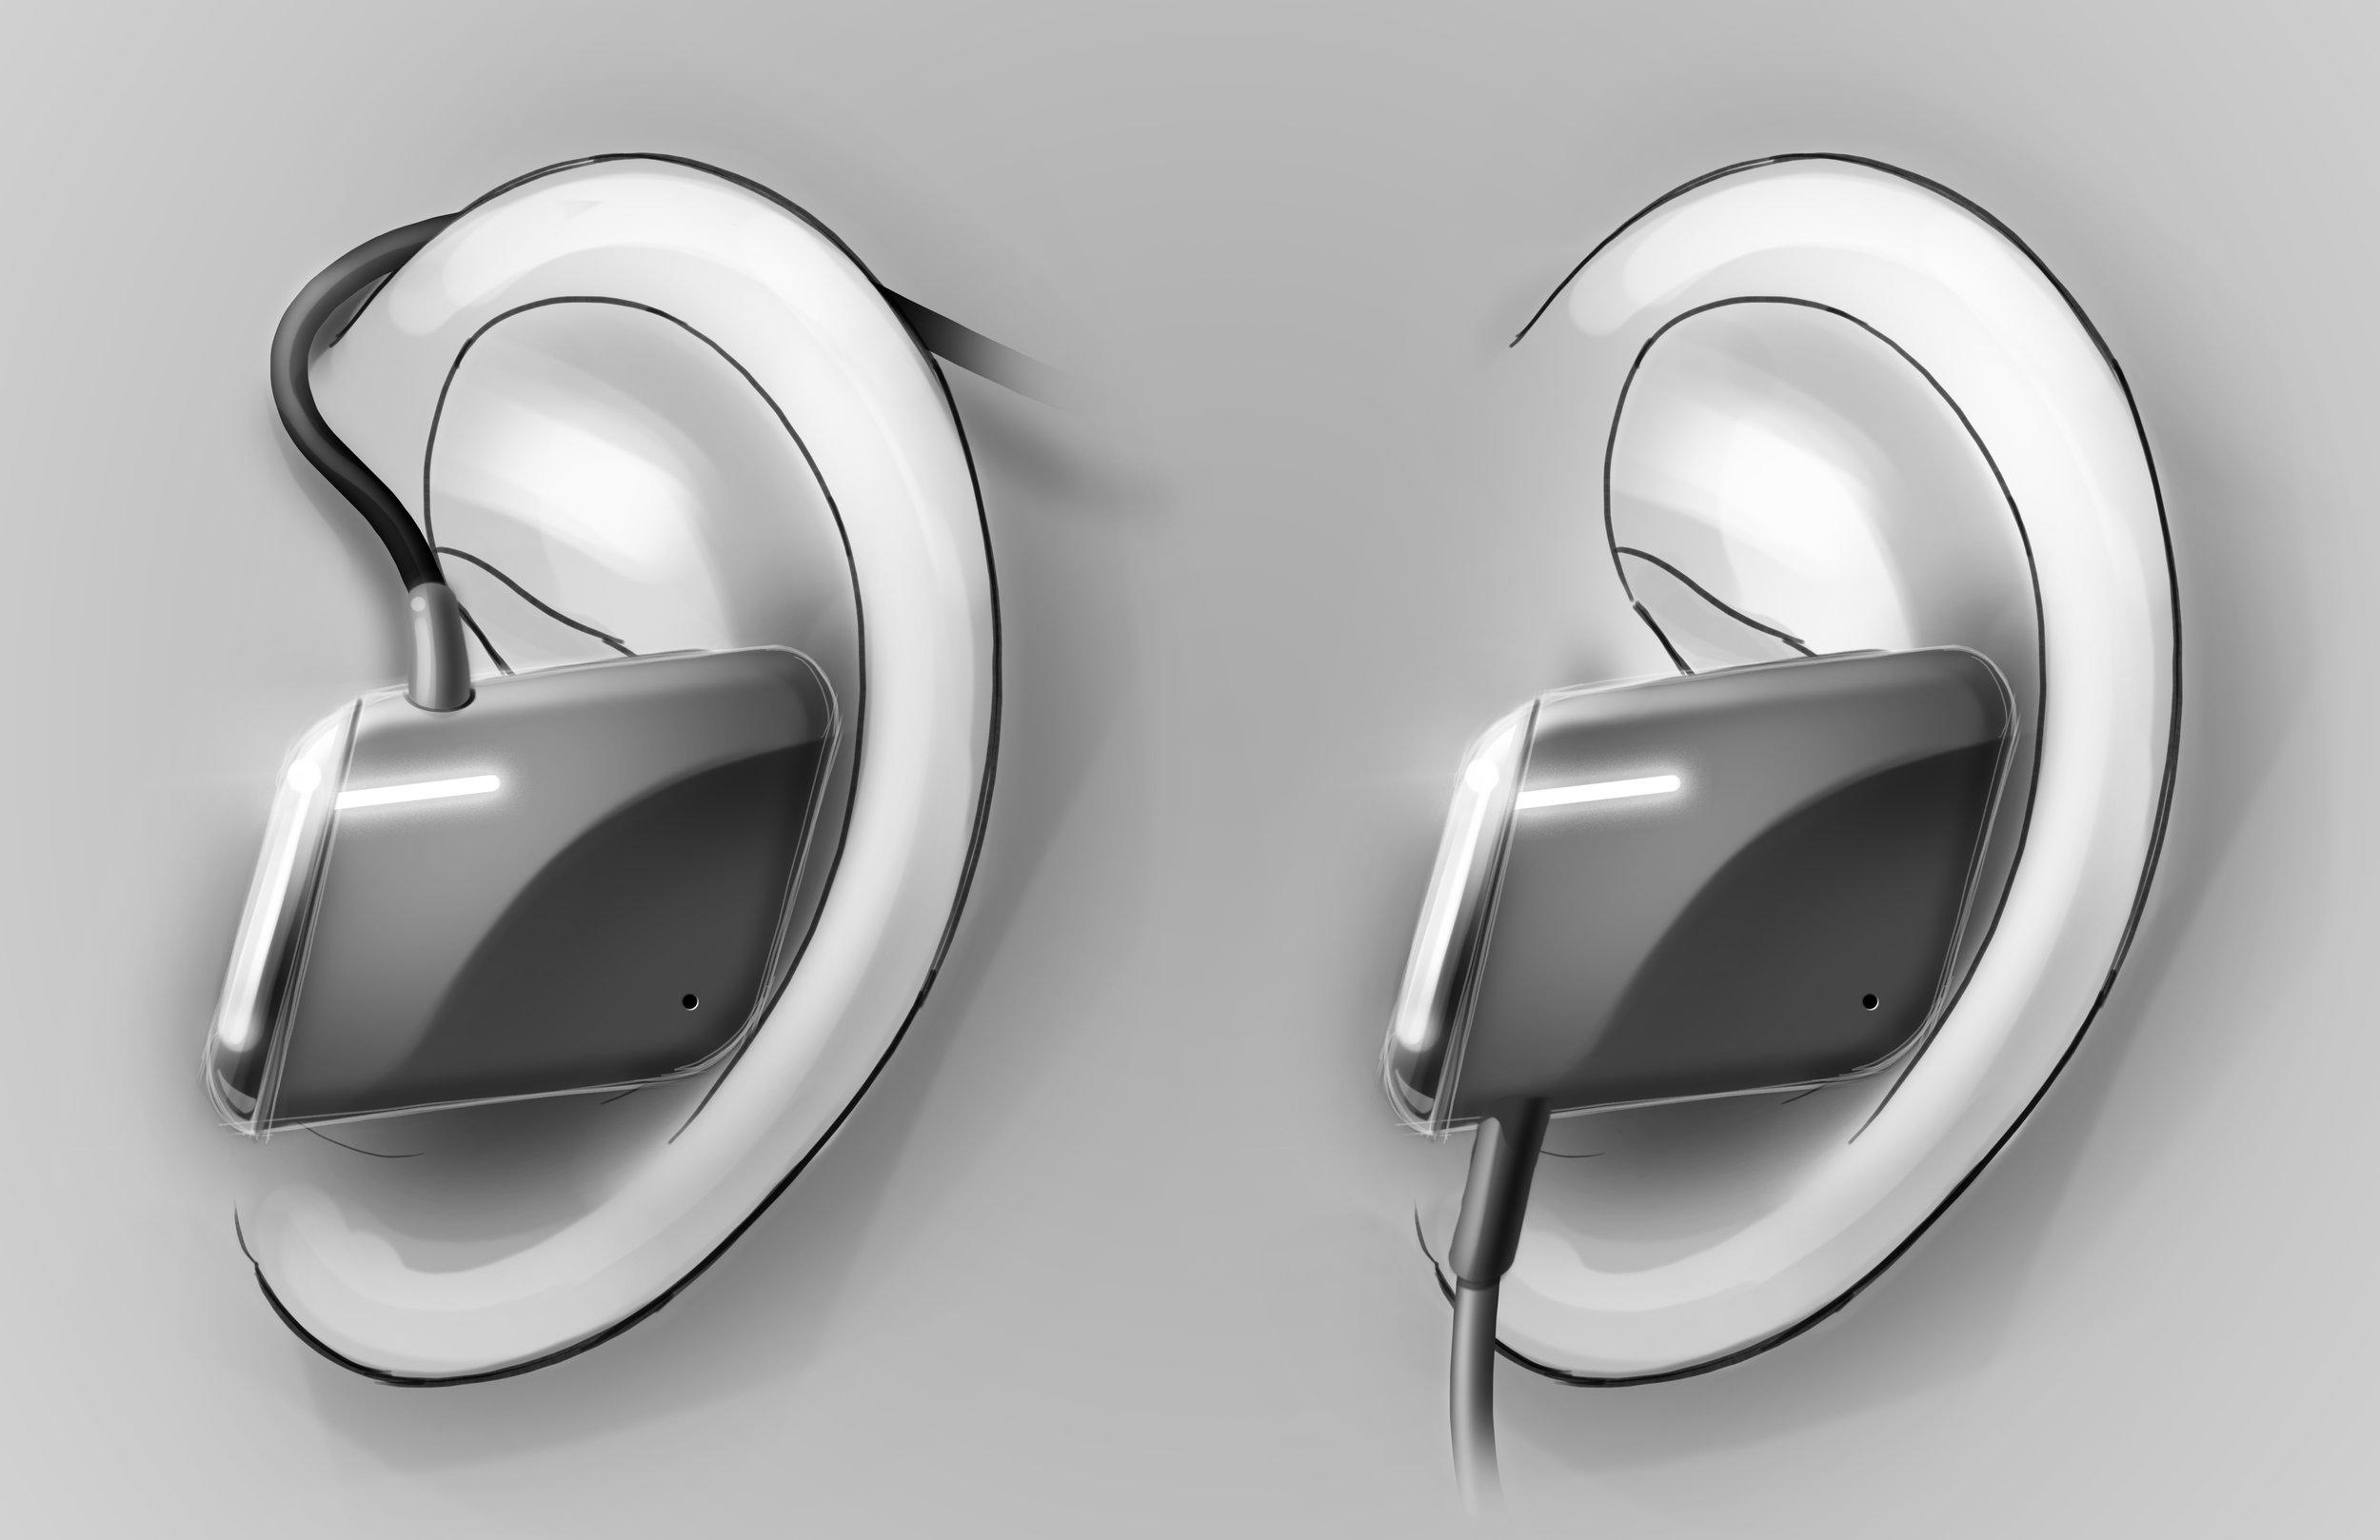 AUD01-concept 7.jpg